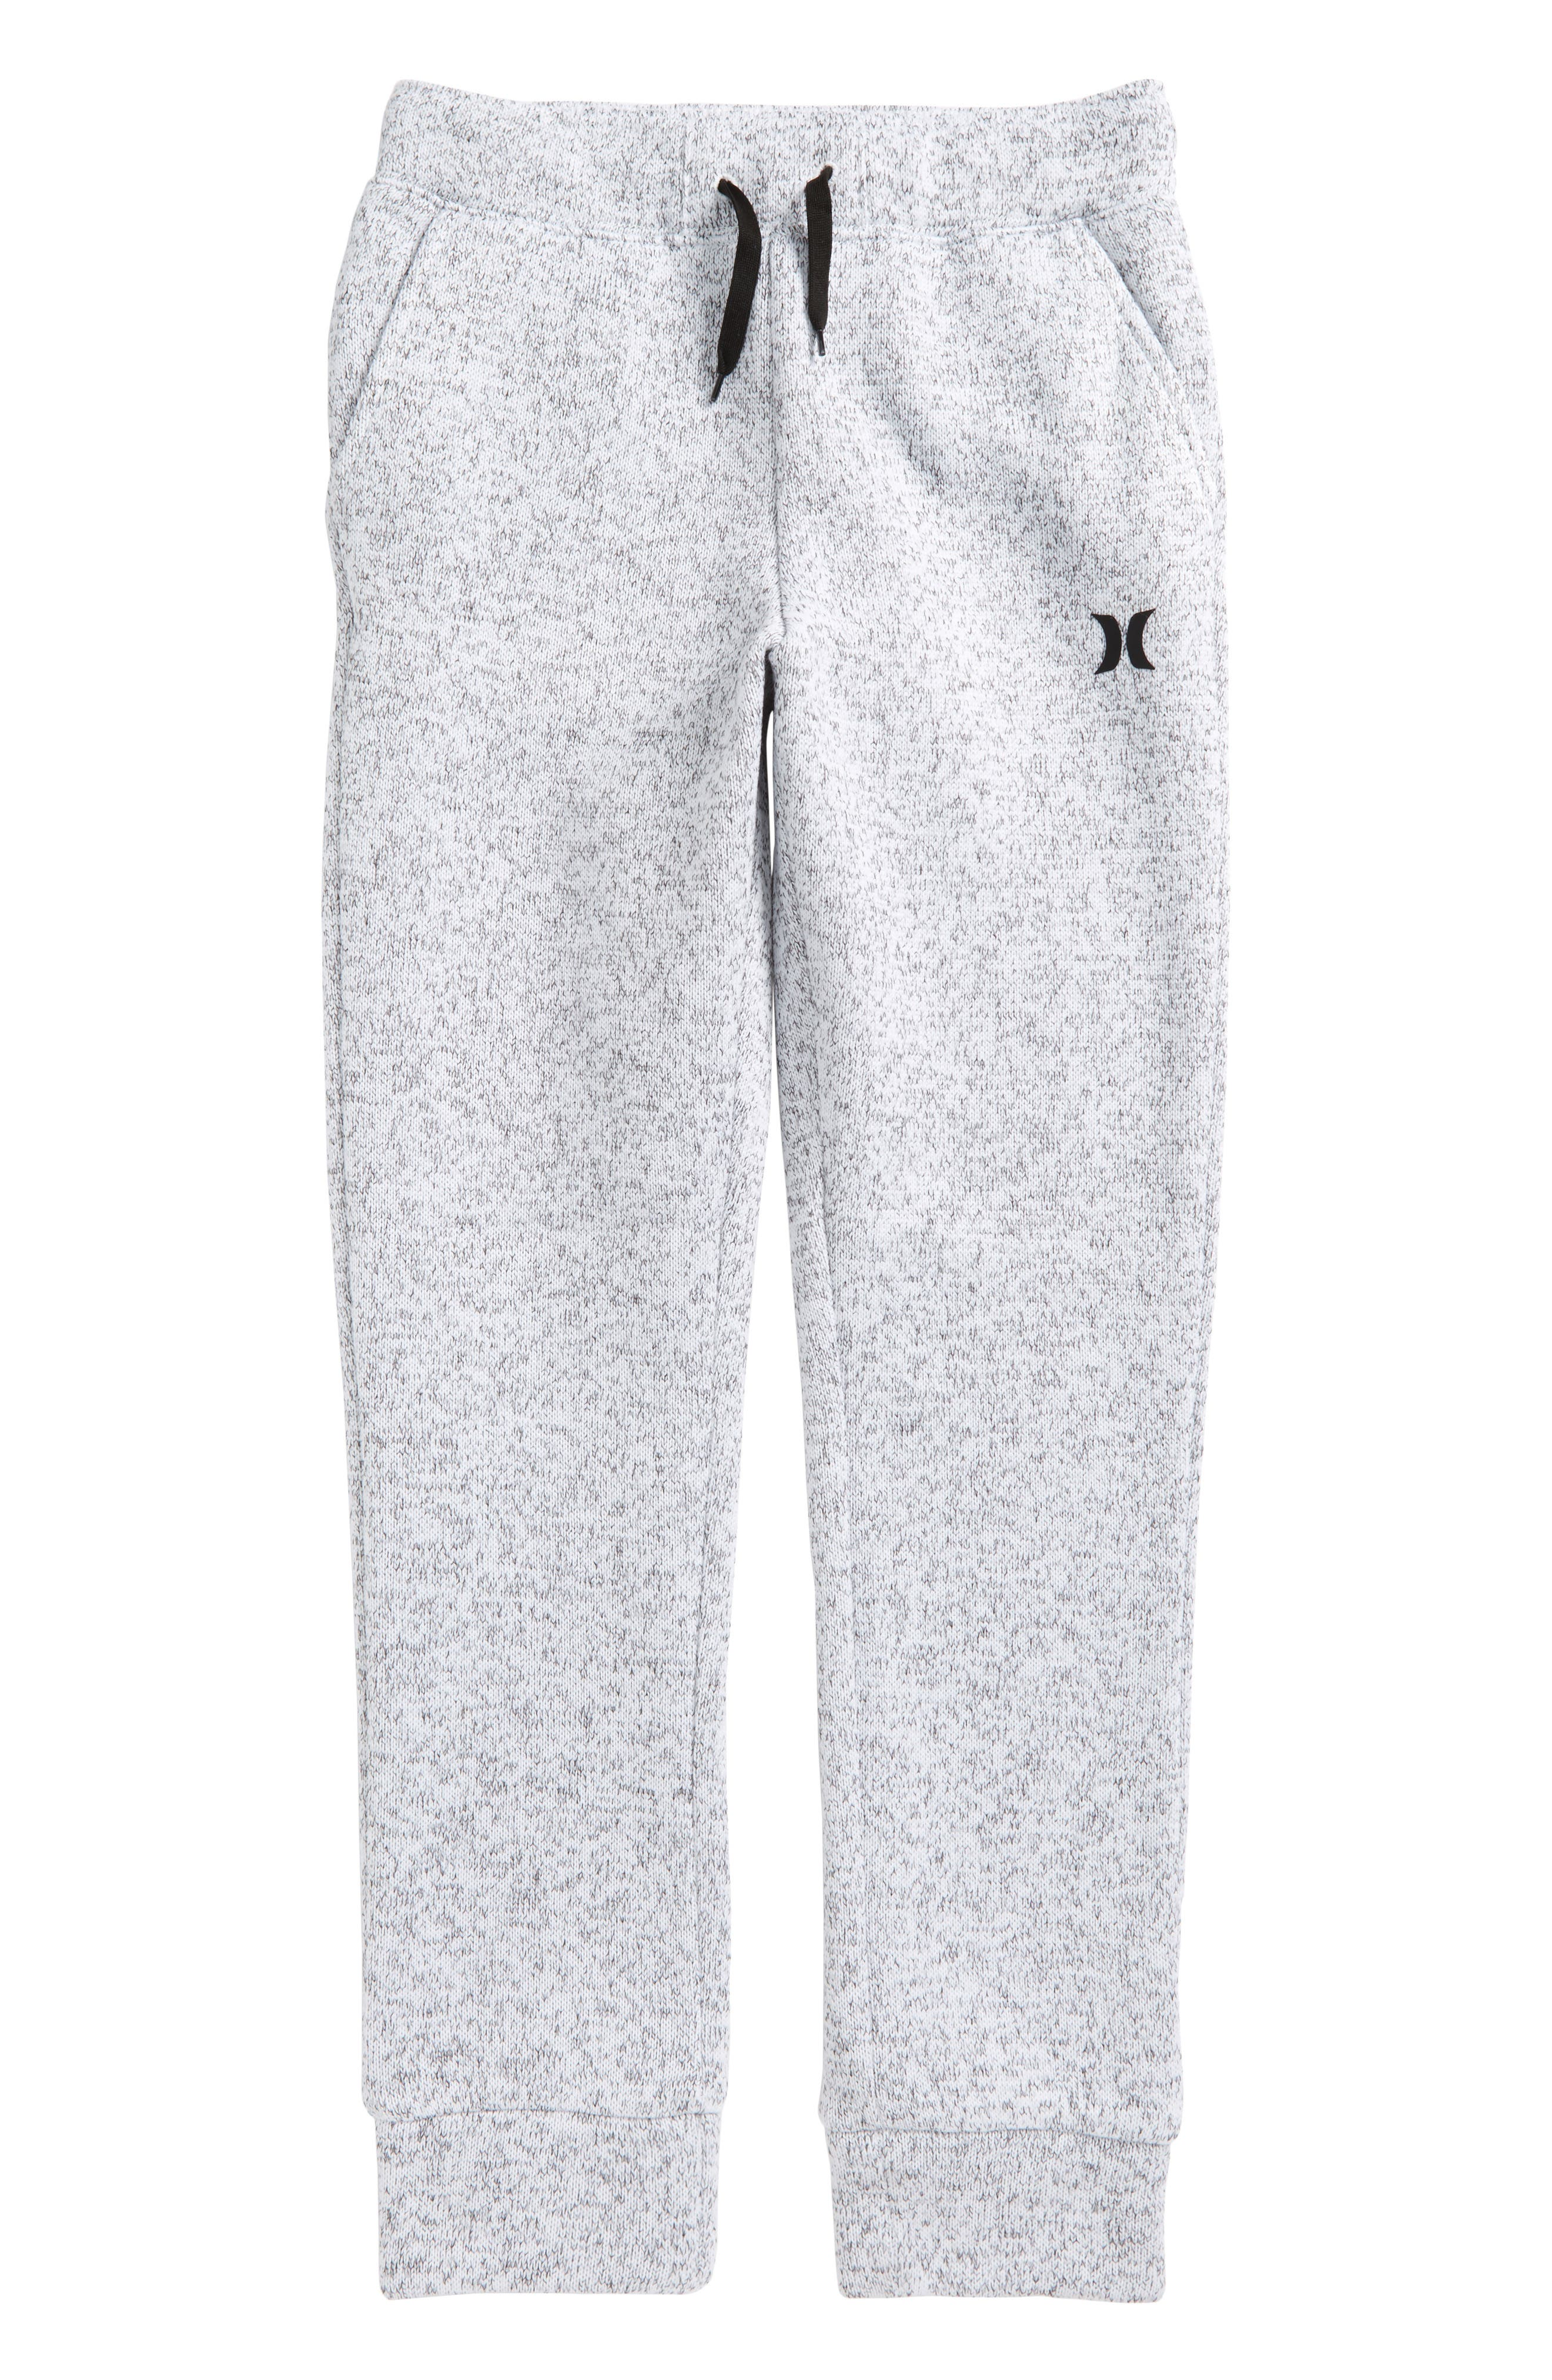 Sweater Knit Fleece Pants,                             Main thumbnail 2, color,